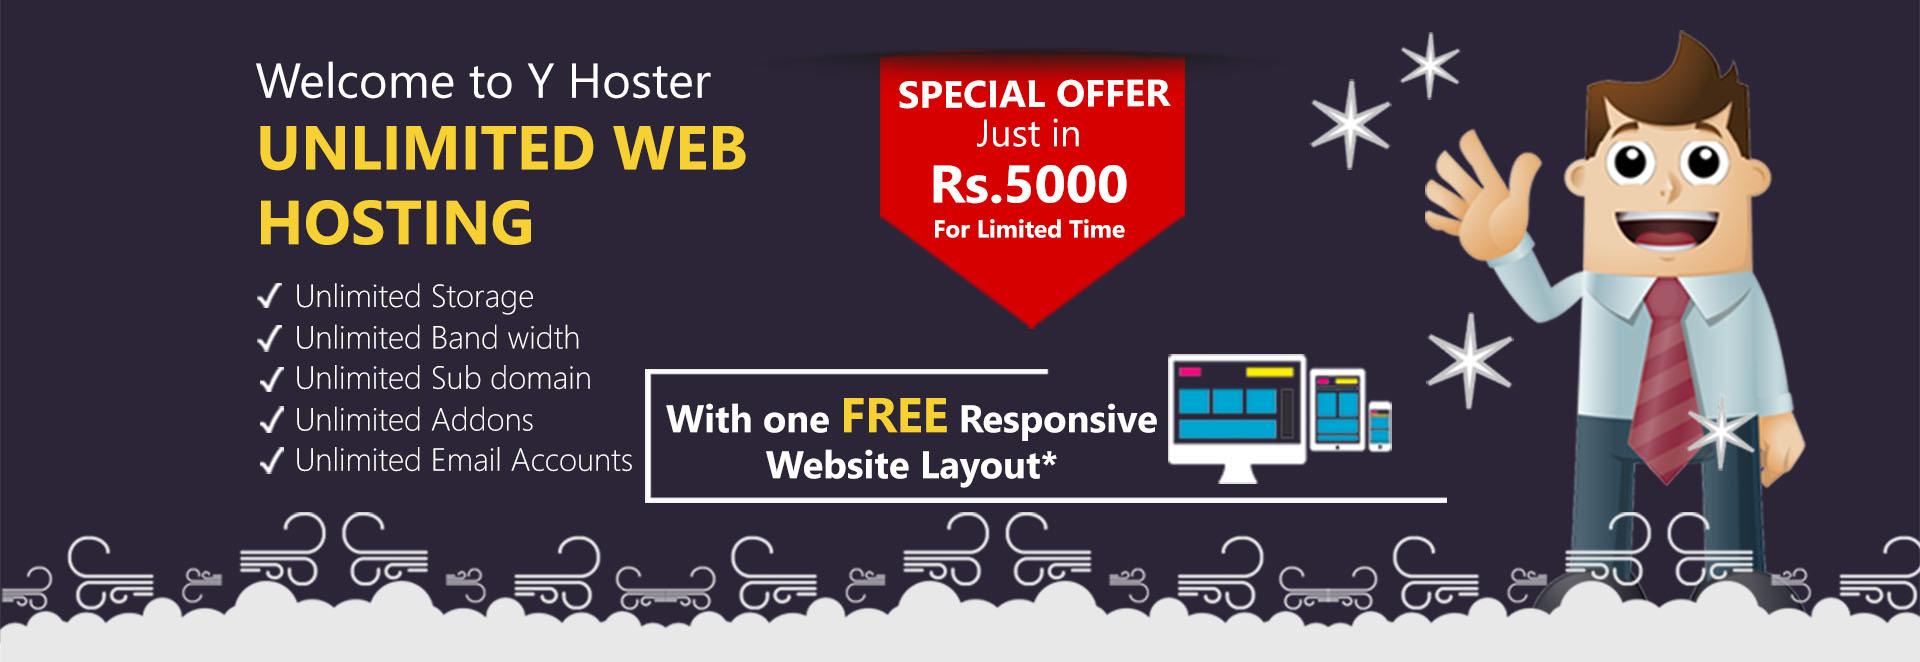 Free web hosting no banner - Free Web Hosting No Banner 20